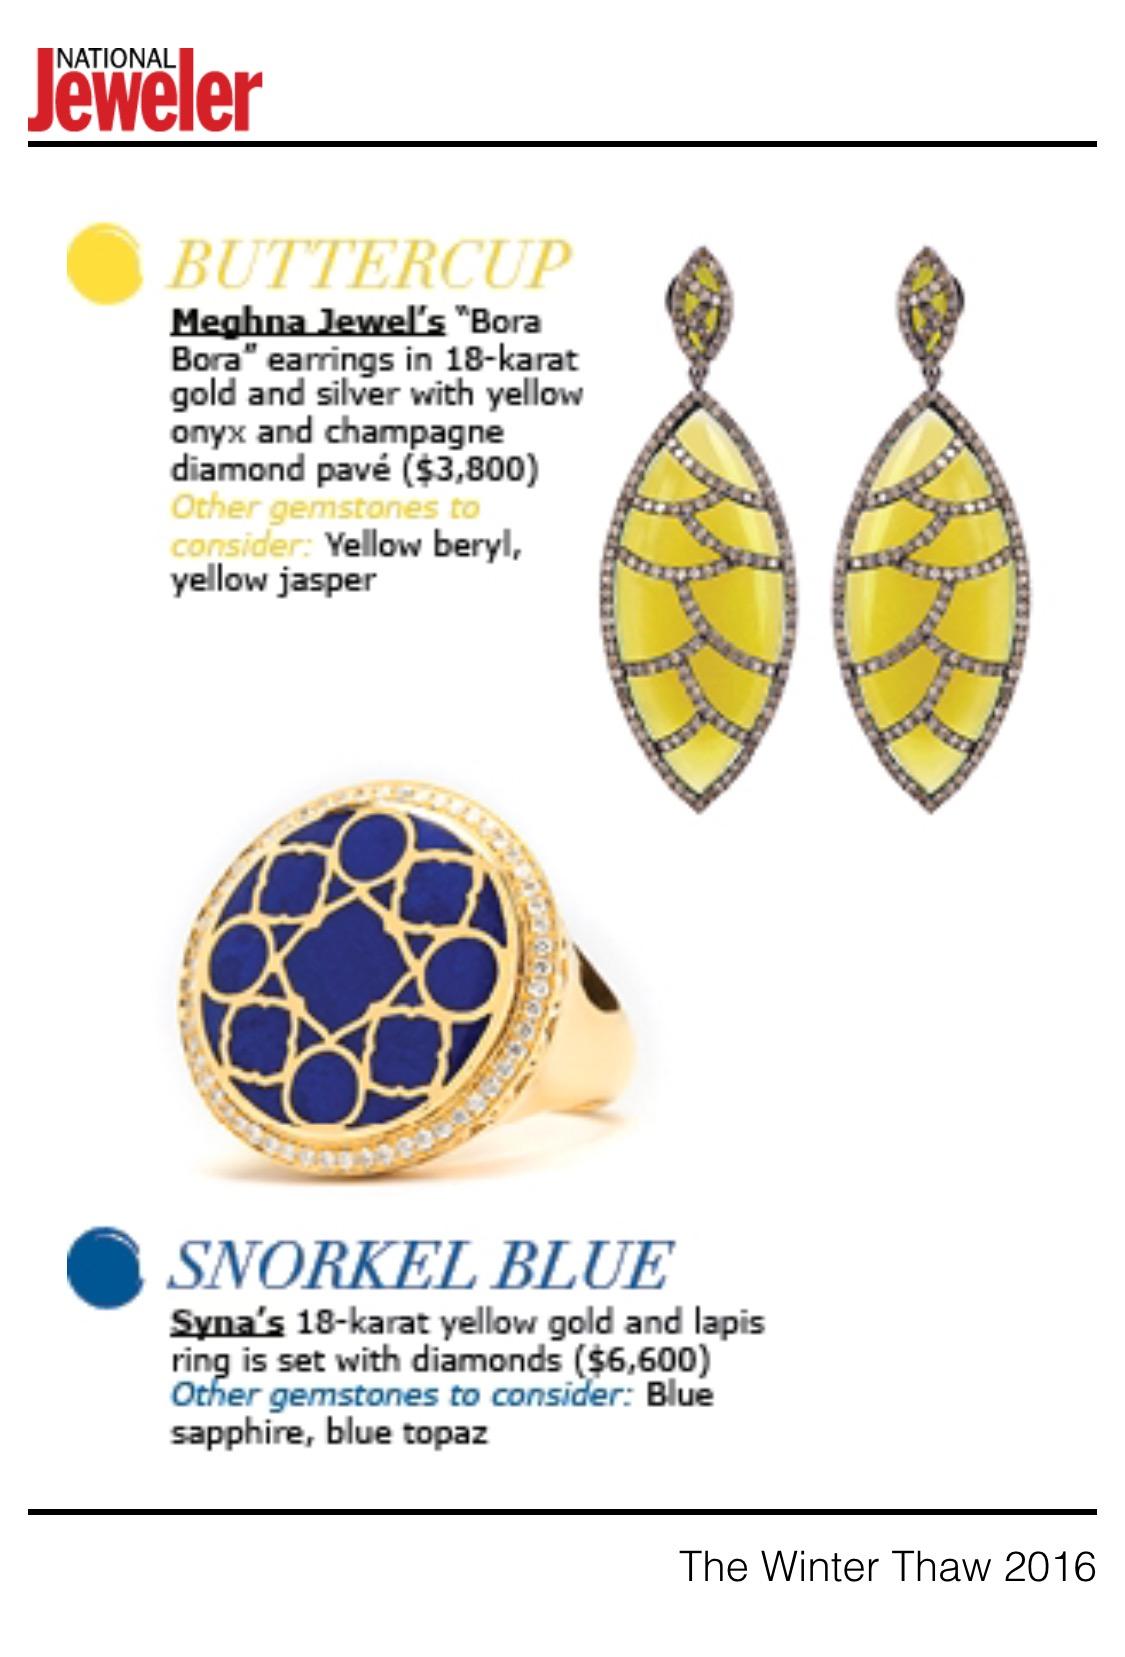 Bora Bora Earrings as featured in National Jeweler